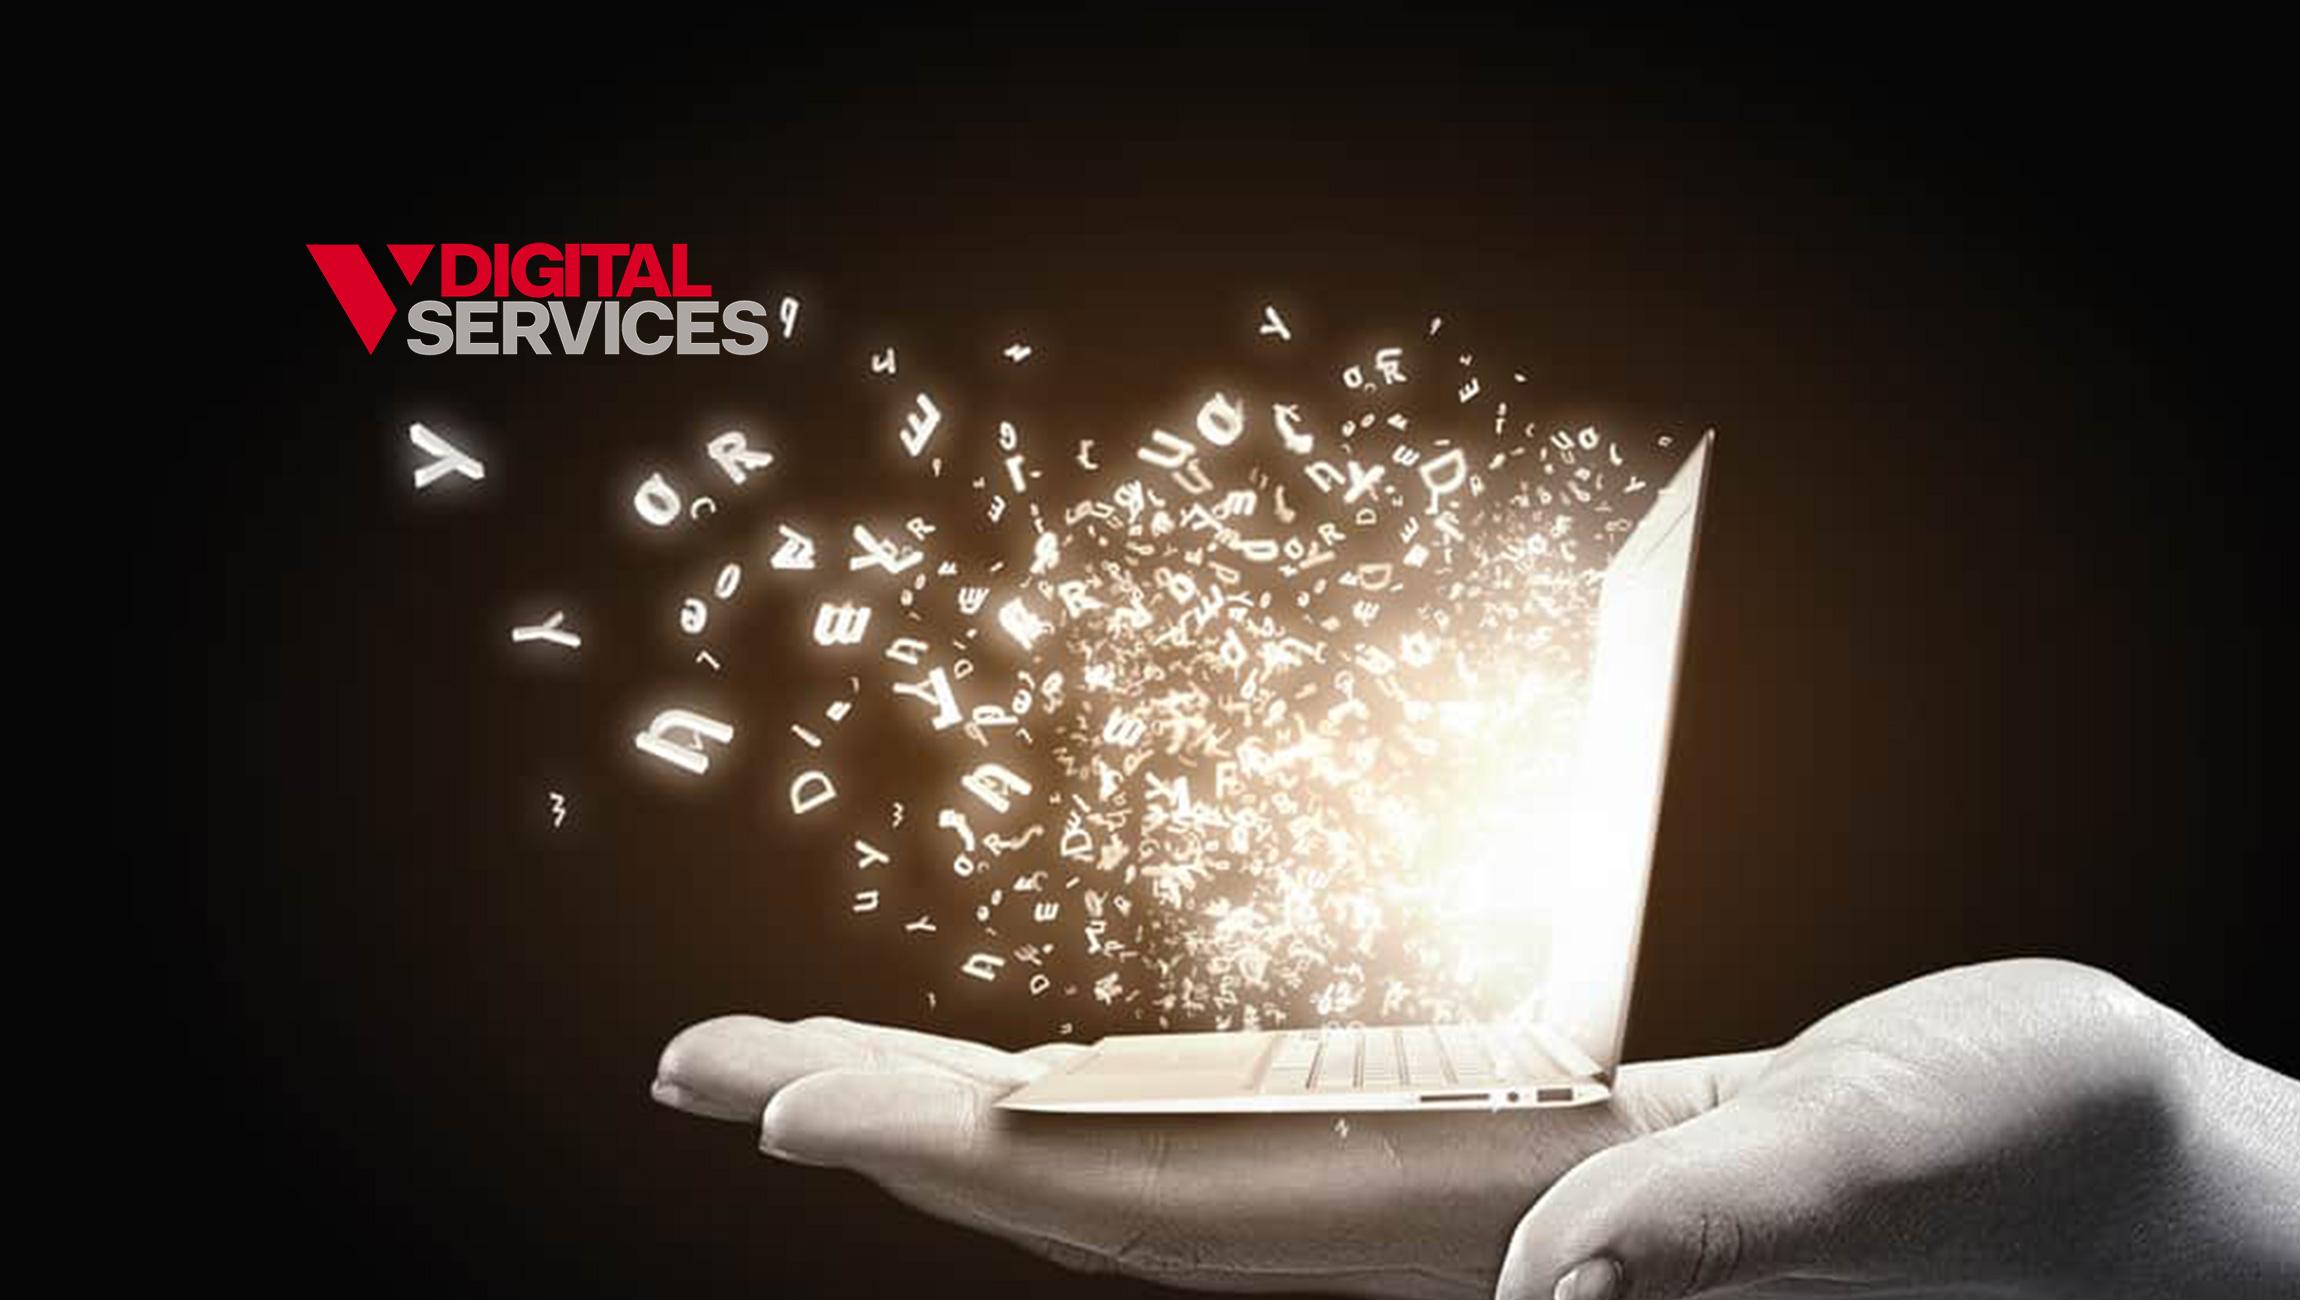 V Digital Services